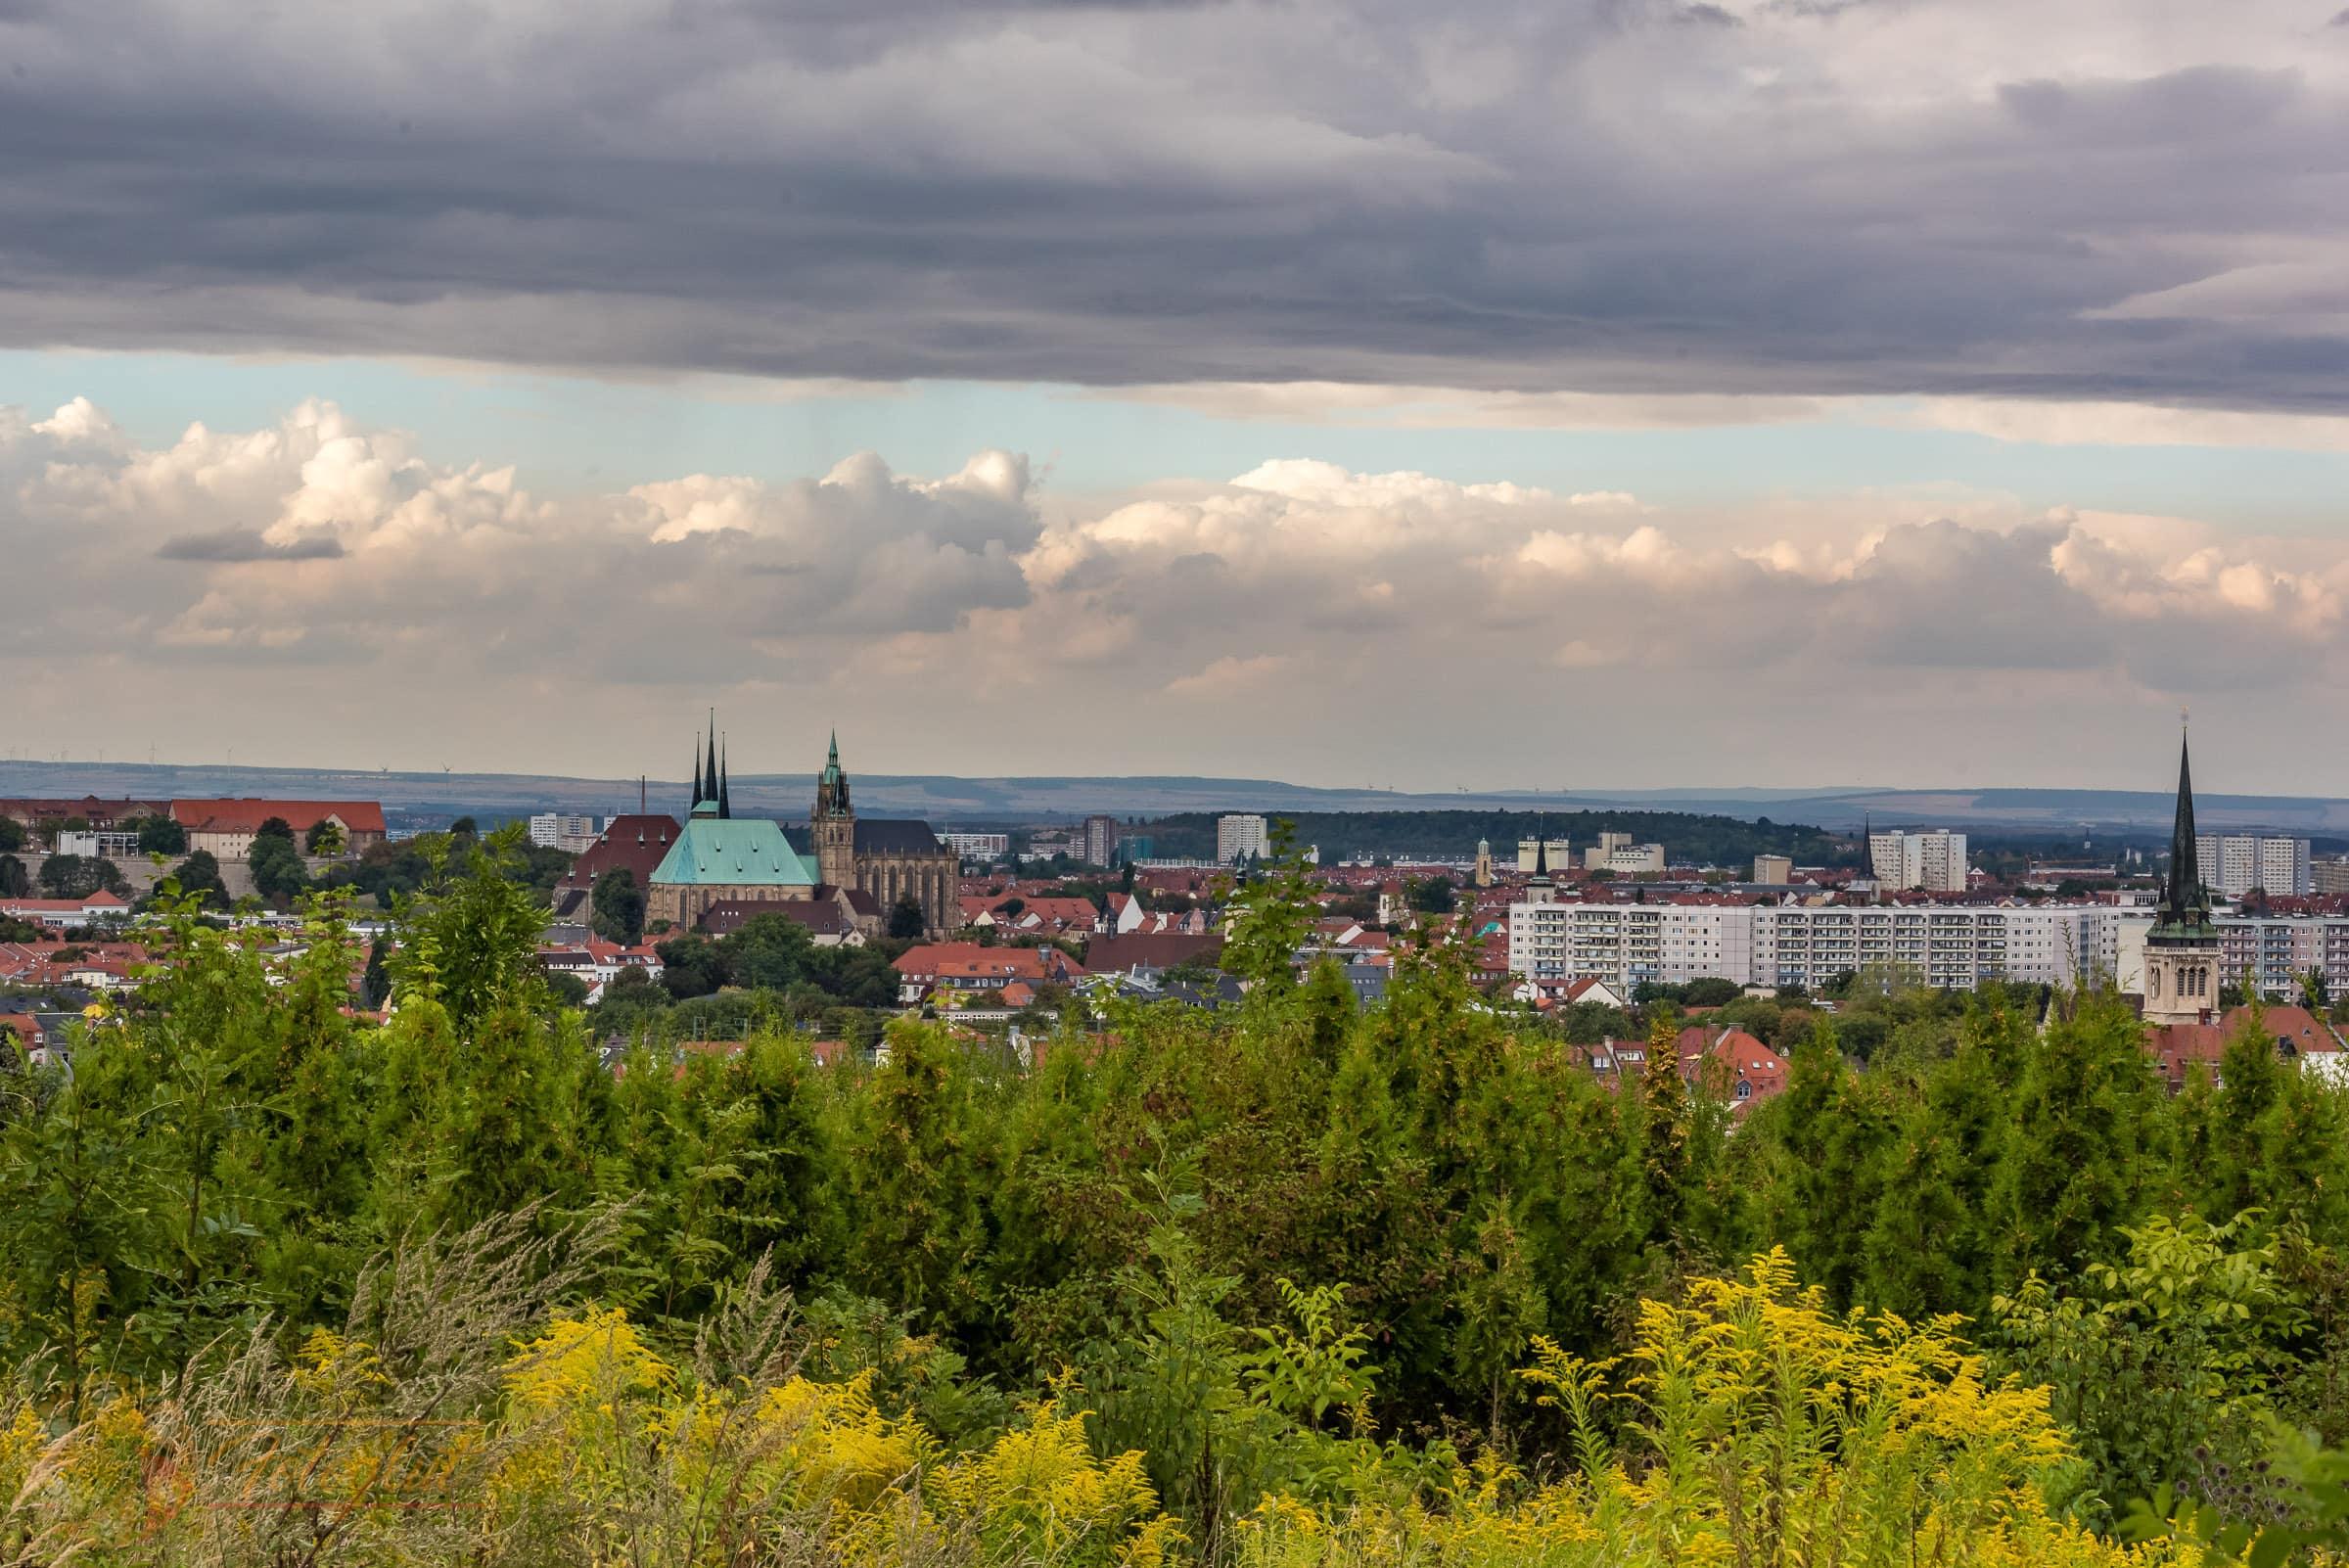 Erfurt Stadtpanorama - Michael Stollmann - fotoglut